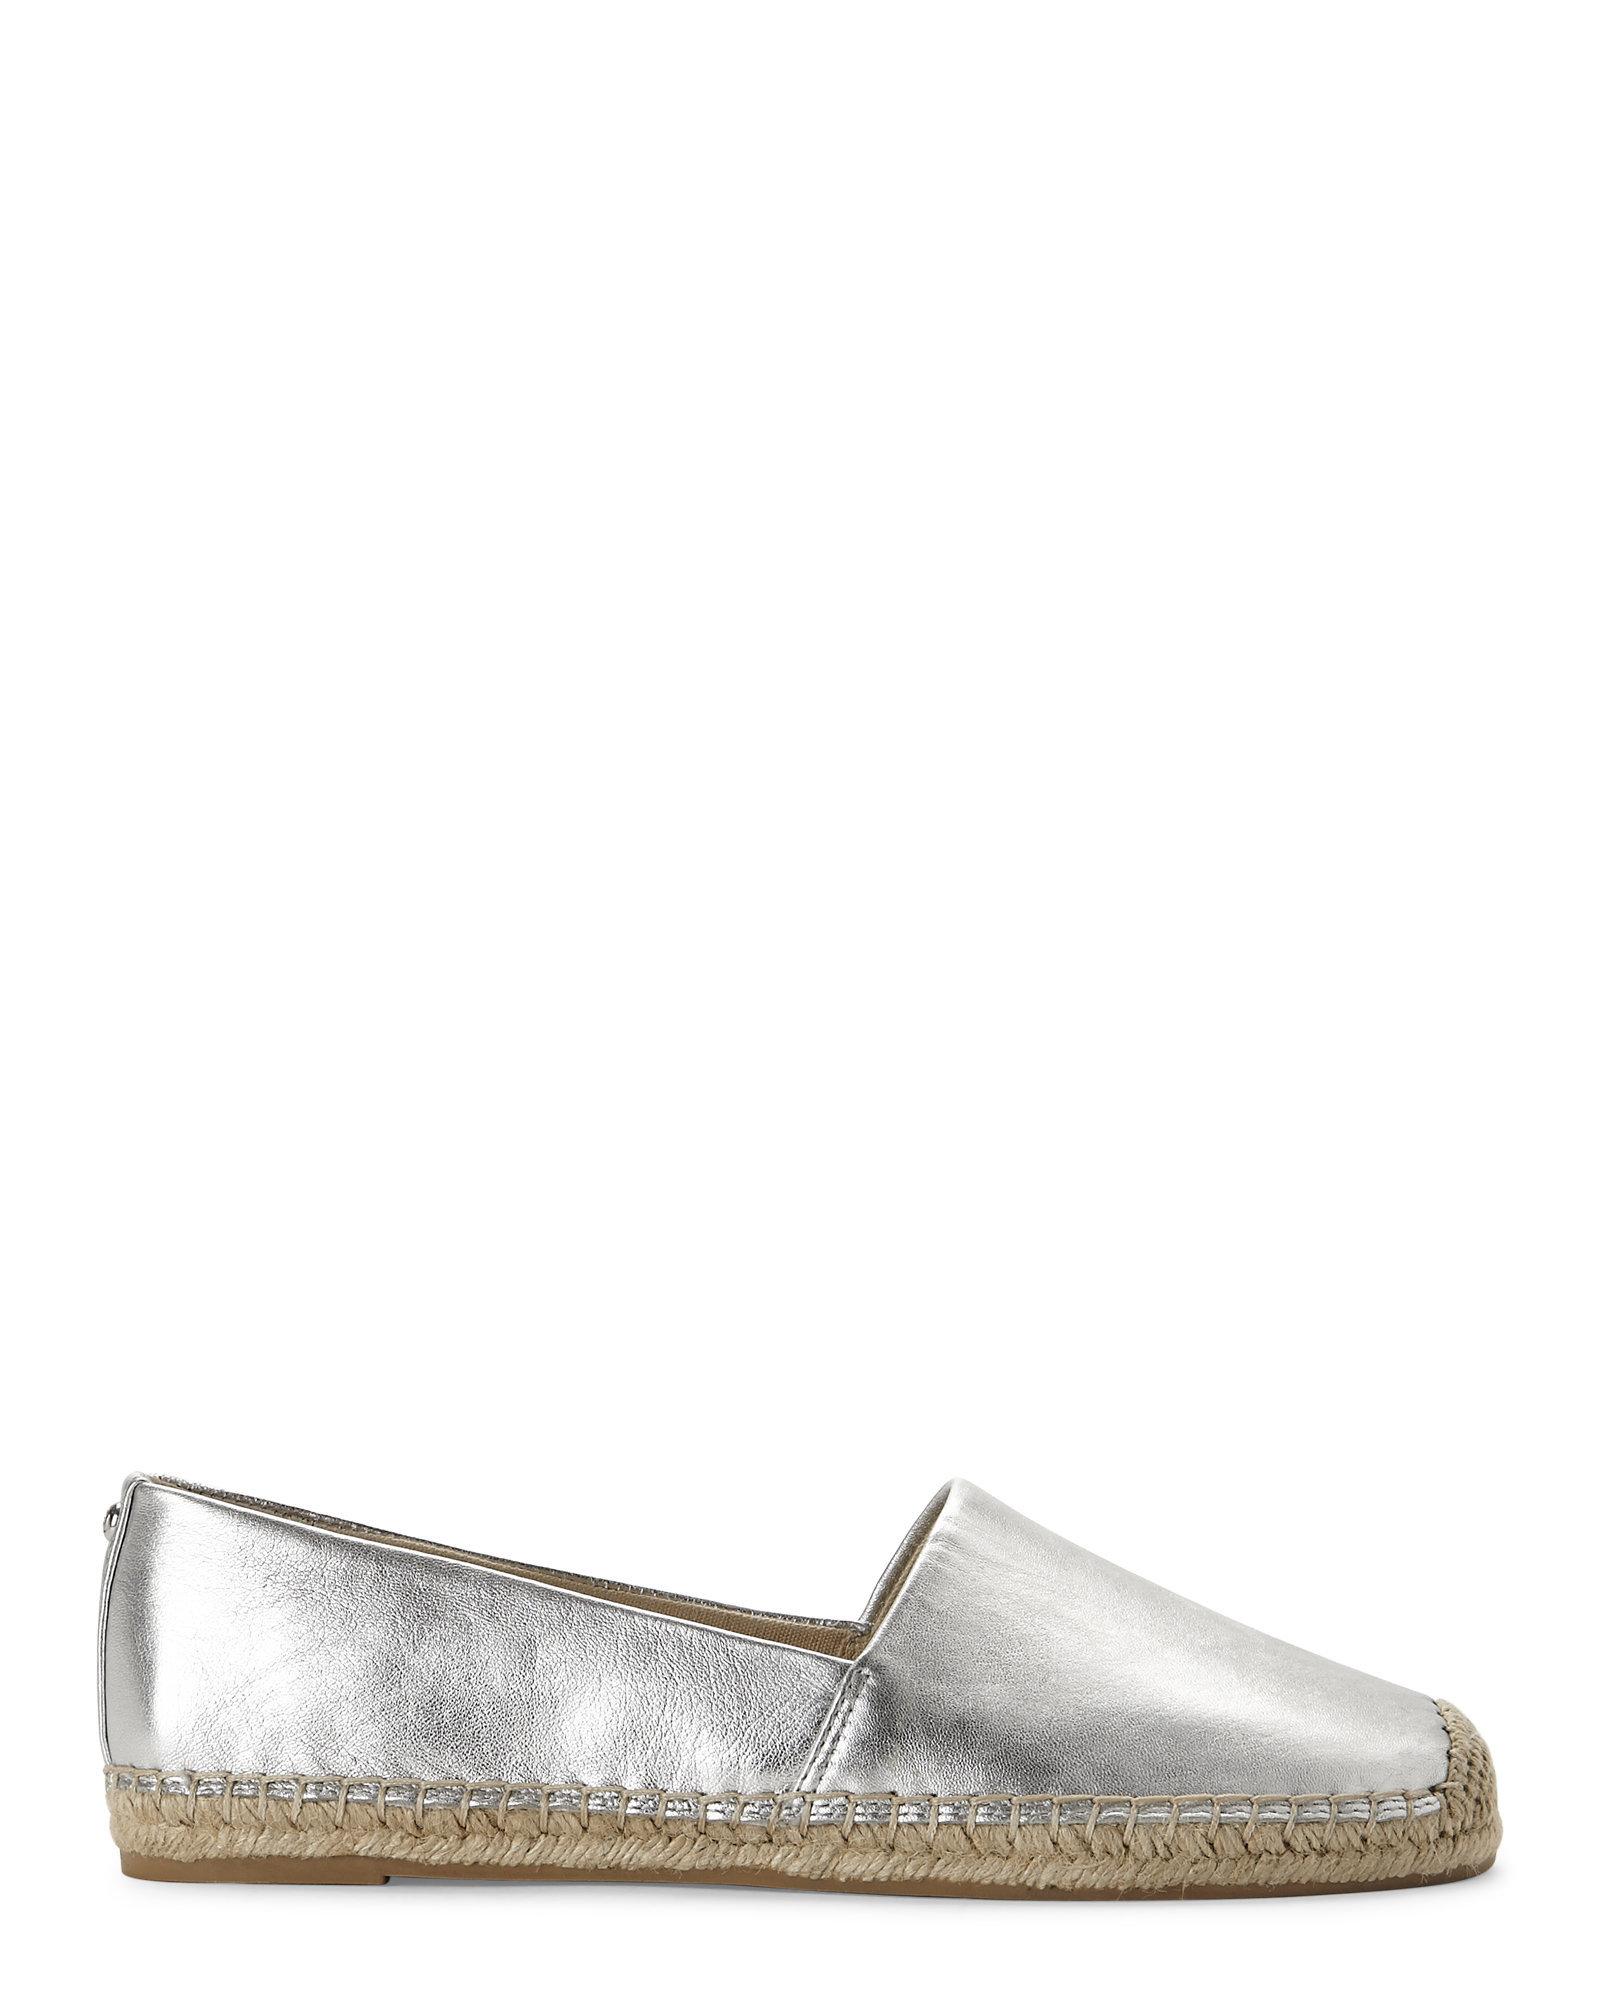 aacb8e9805c9e9 Lyst - Sam Edelman Silver Lynn Espadrille Flats in Metallic